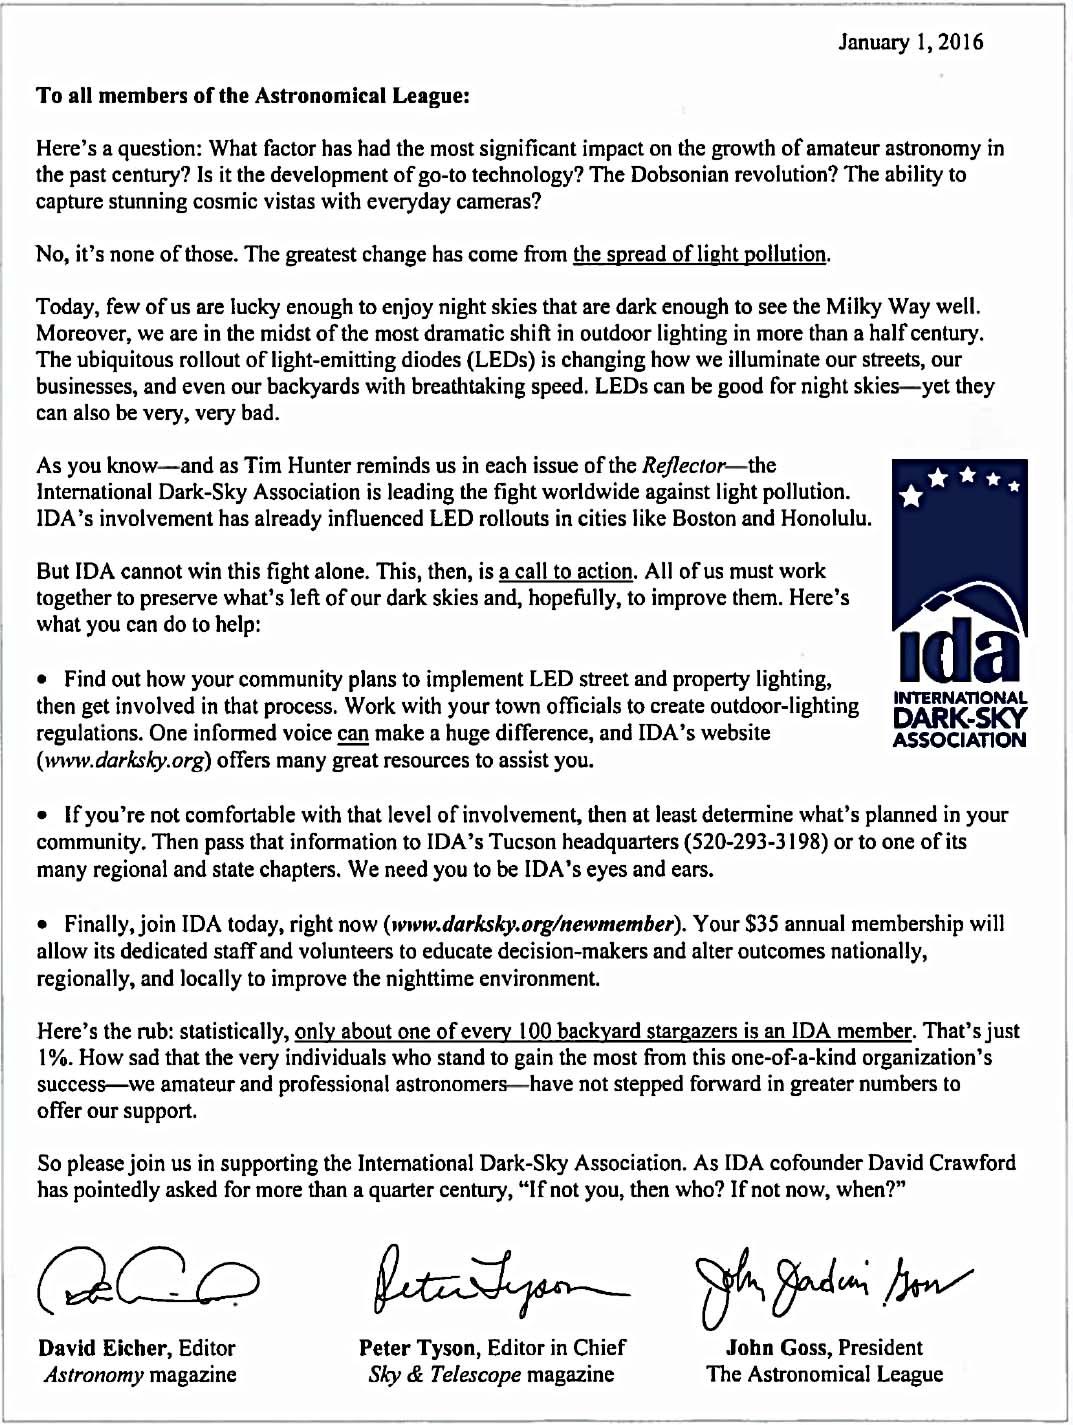 Joint letter on behalf of IDA